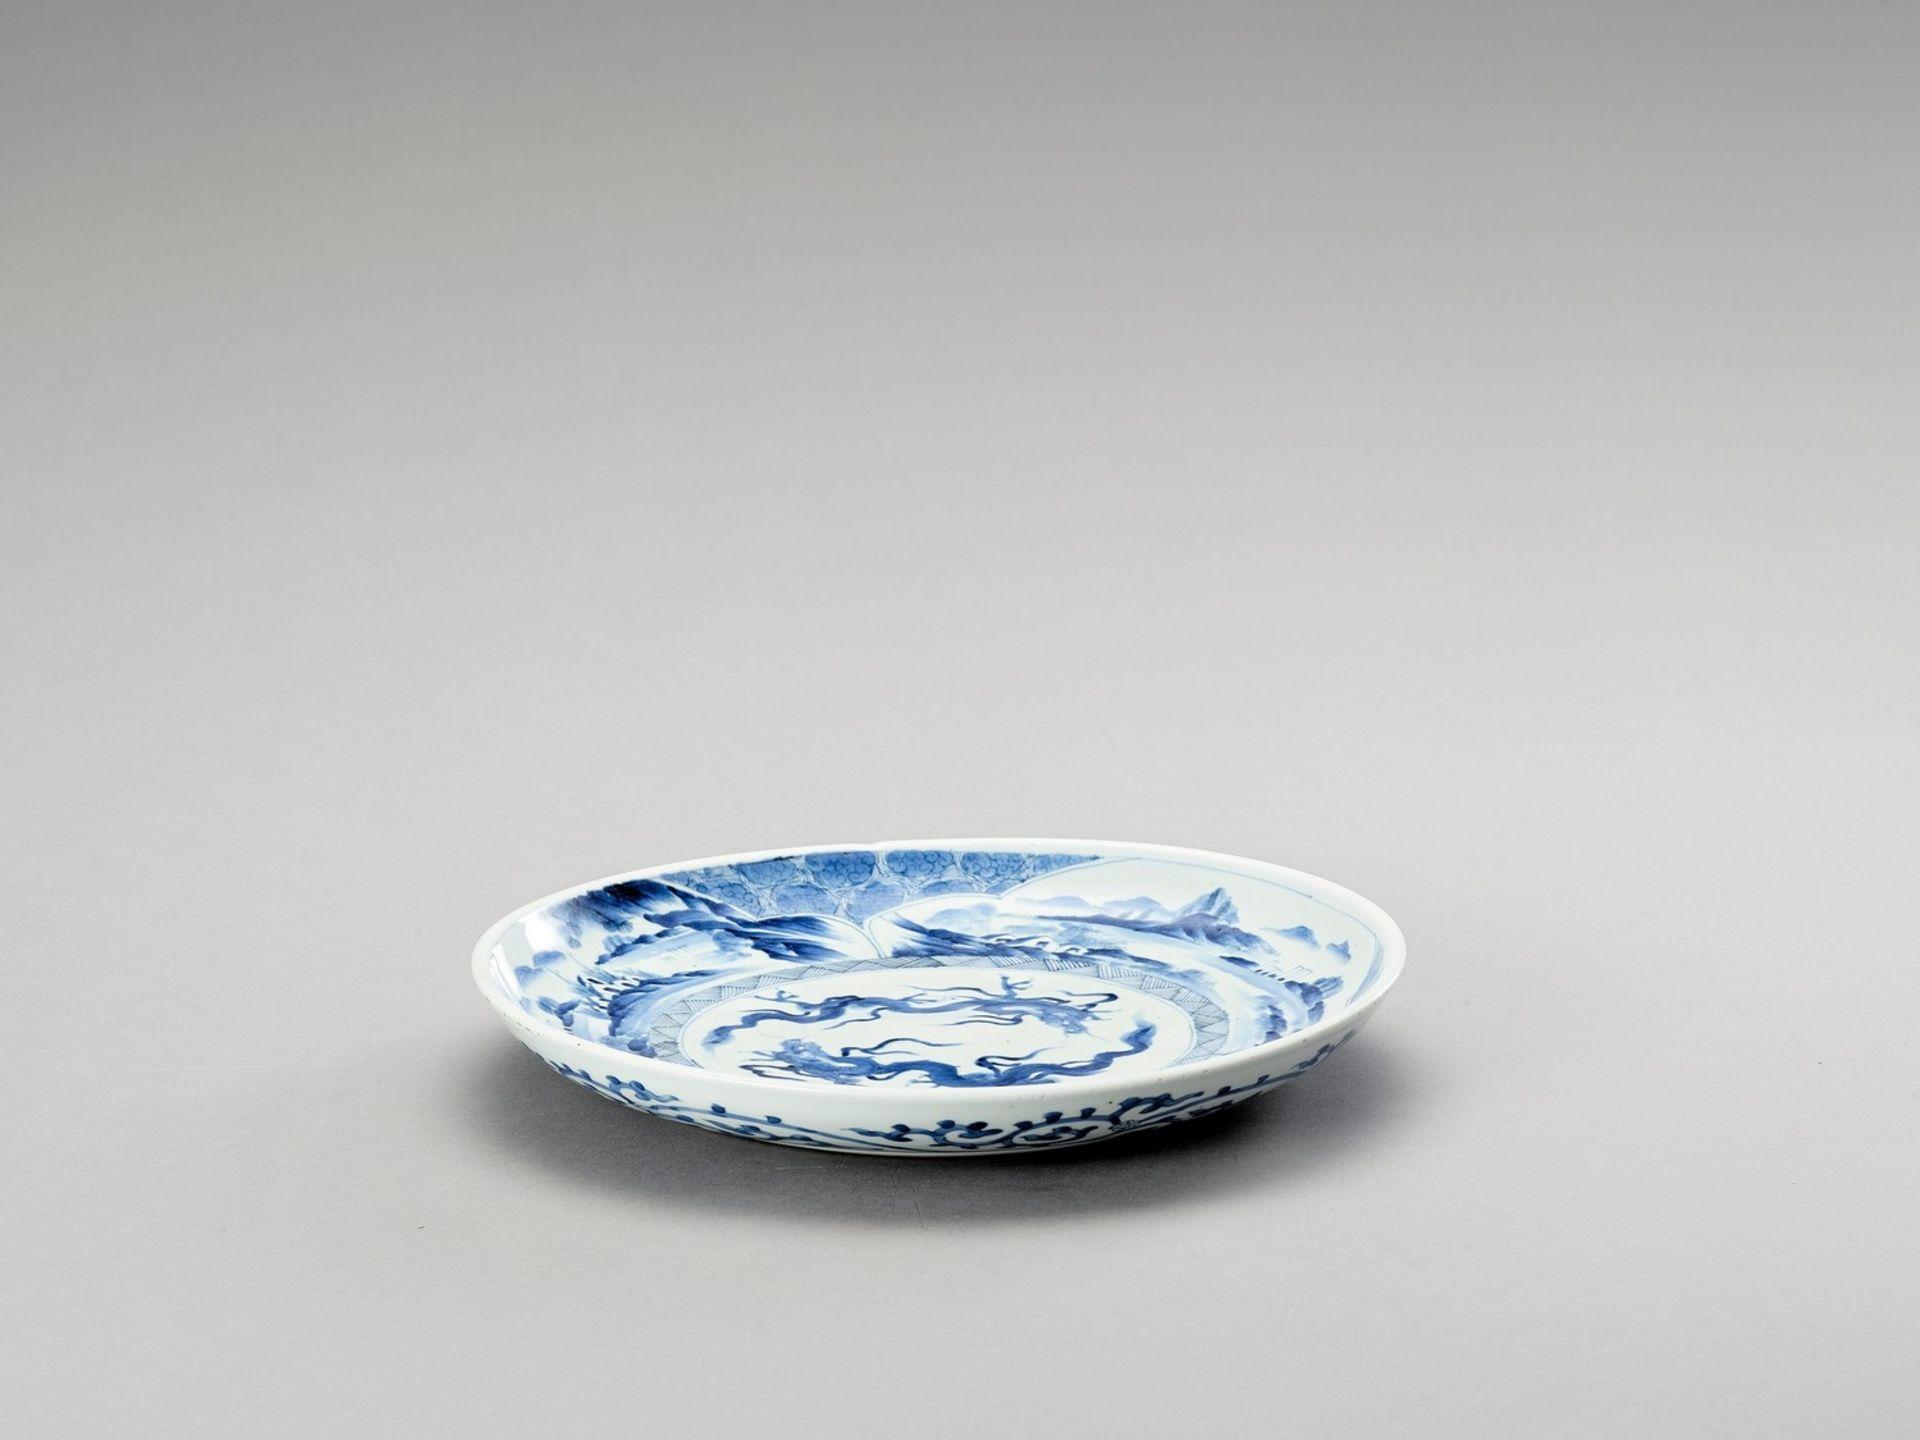 A BLUE AND WHITE PORCELAIN 'DRAGON' PLATE - Bild 4 aus 4